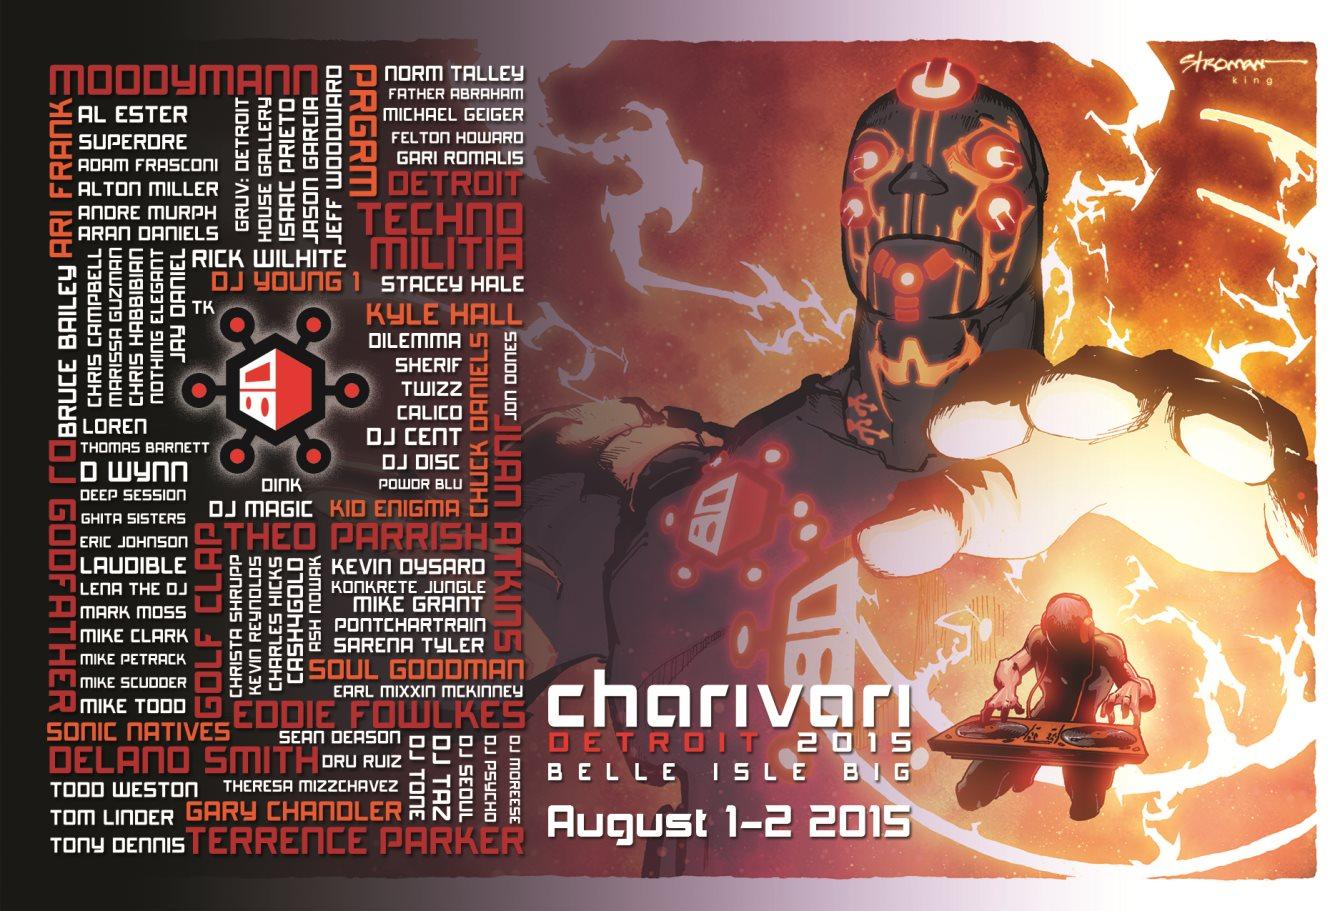 Charivari Detroit 2015 - Flyer front